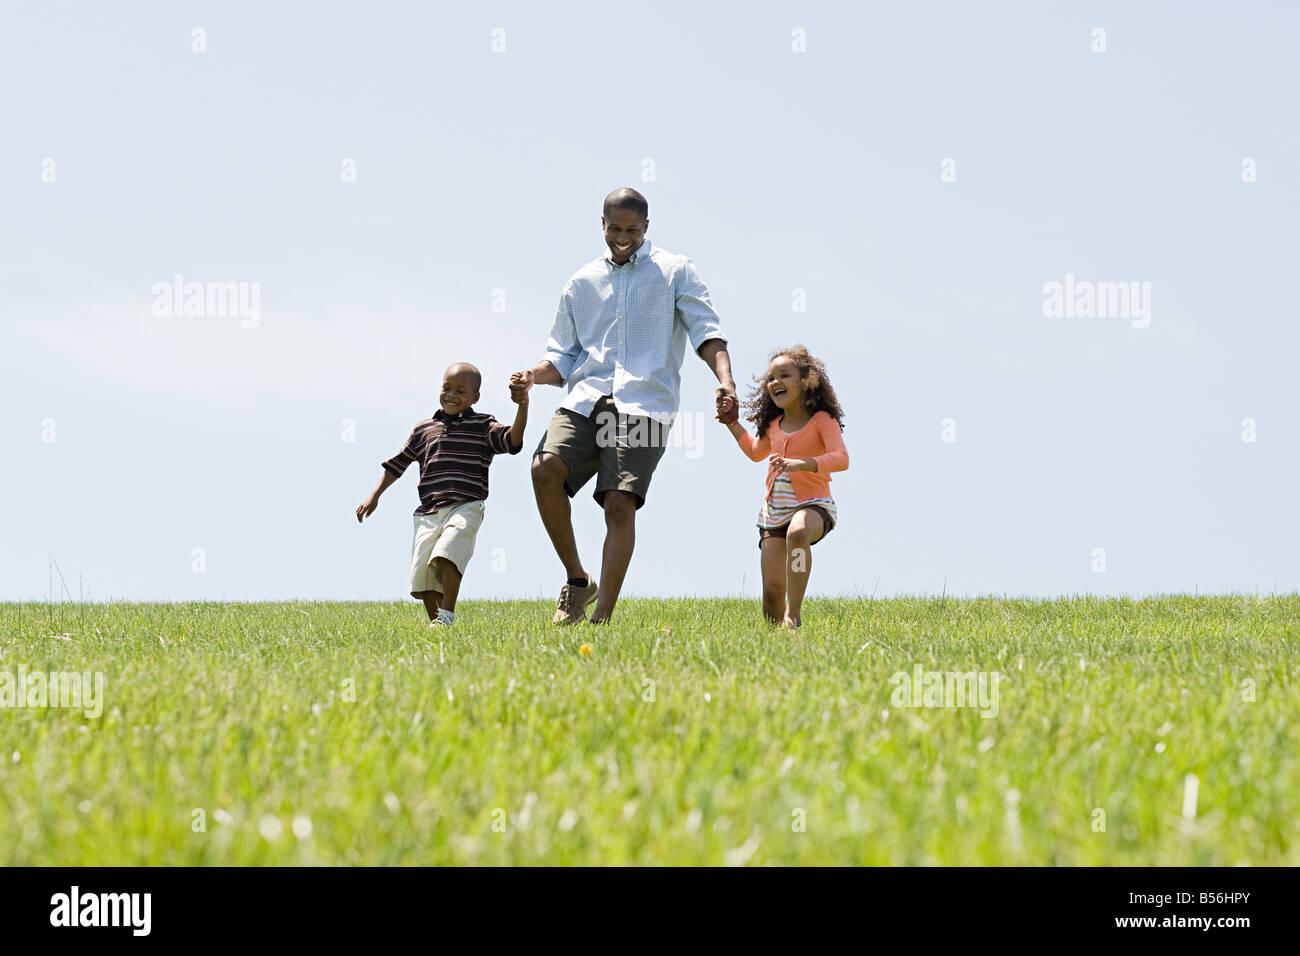 Vater und Kinder im Feld Stockfoto